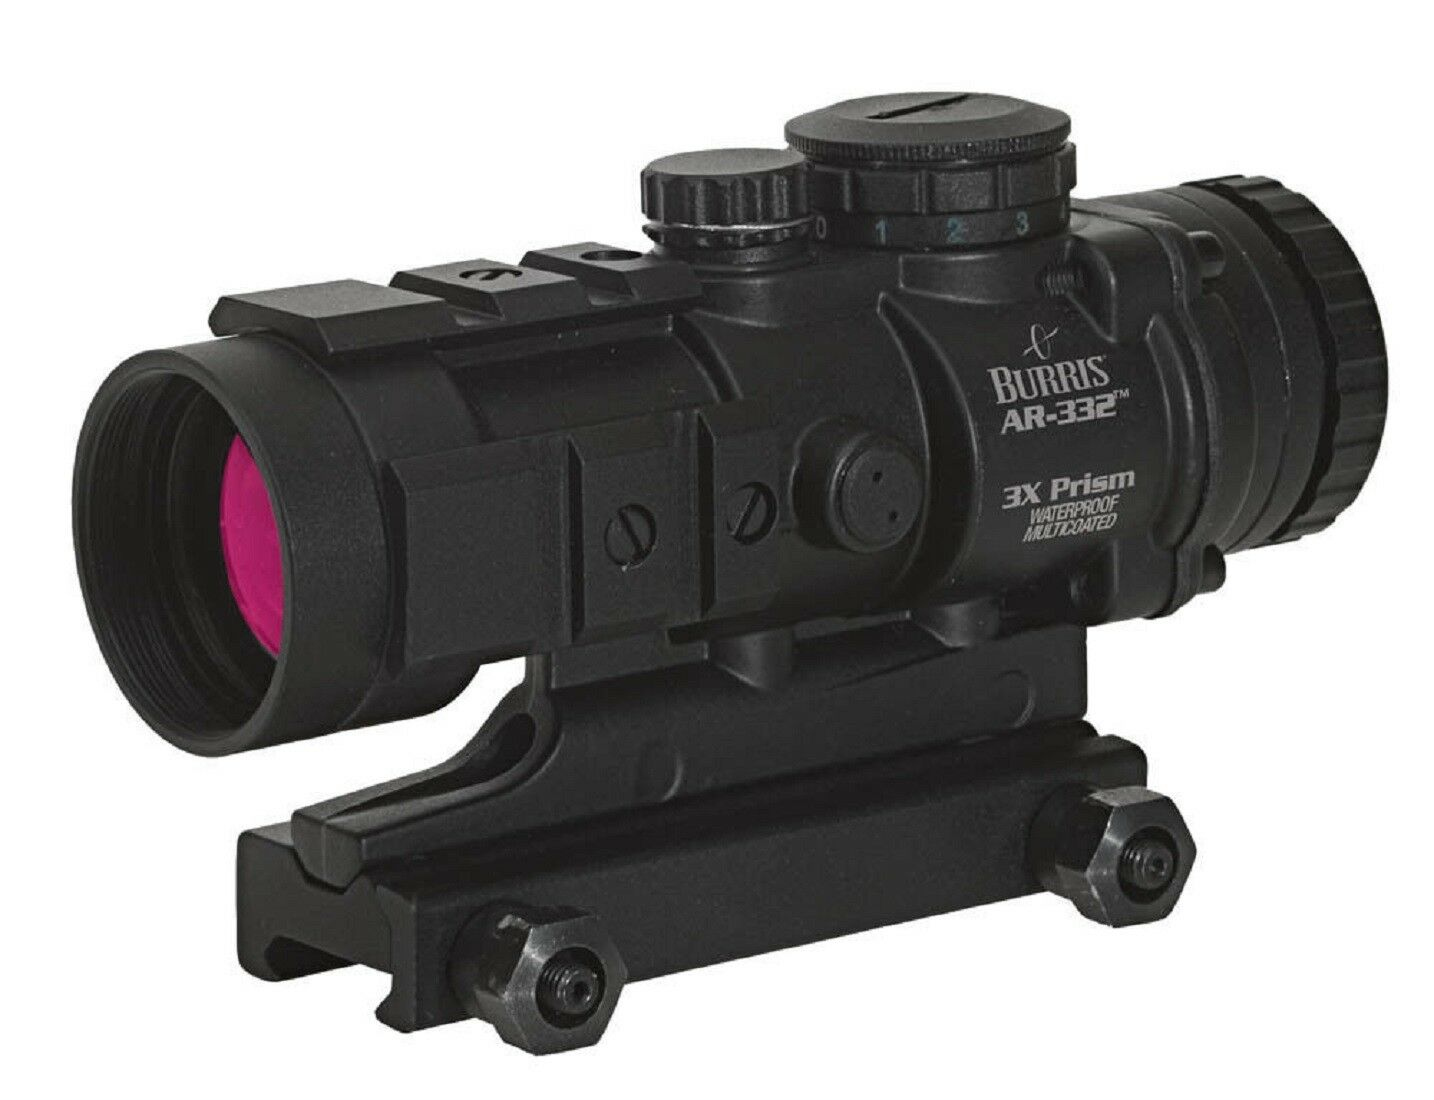 Burris AR-332 Ar Tactical 3X32 Prism Sight Rifle Scope   eBay a5d95a7db1e8